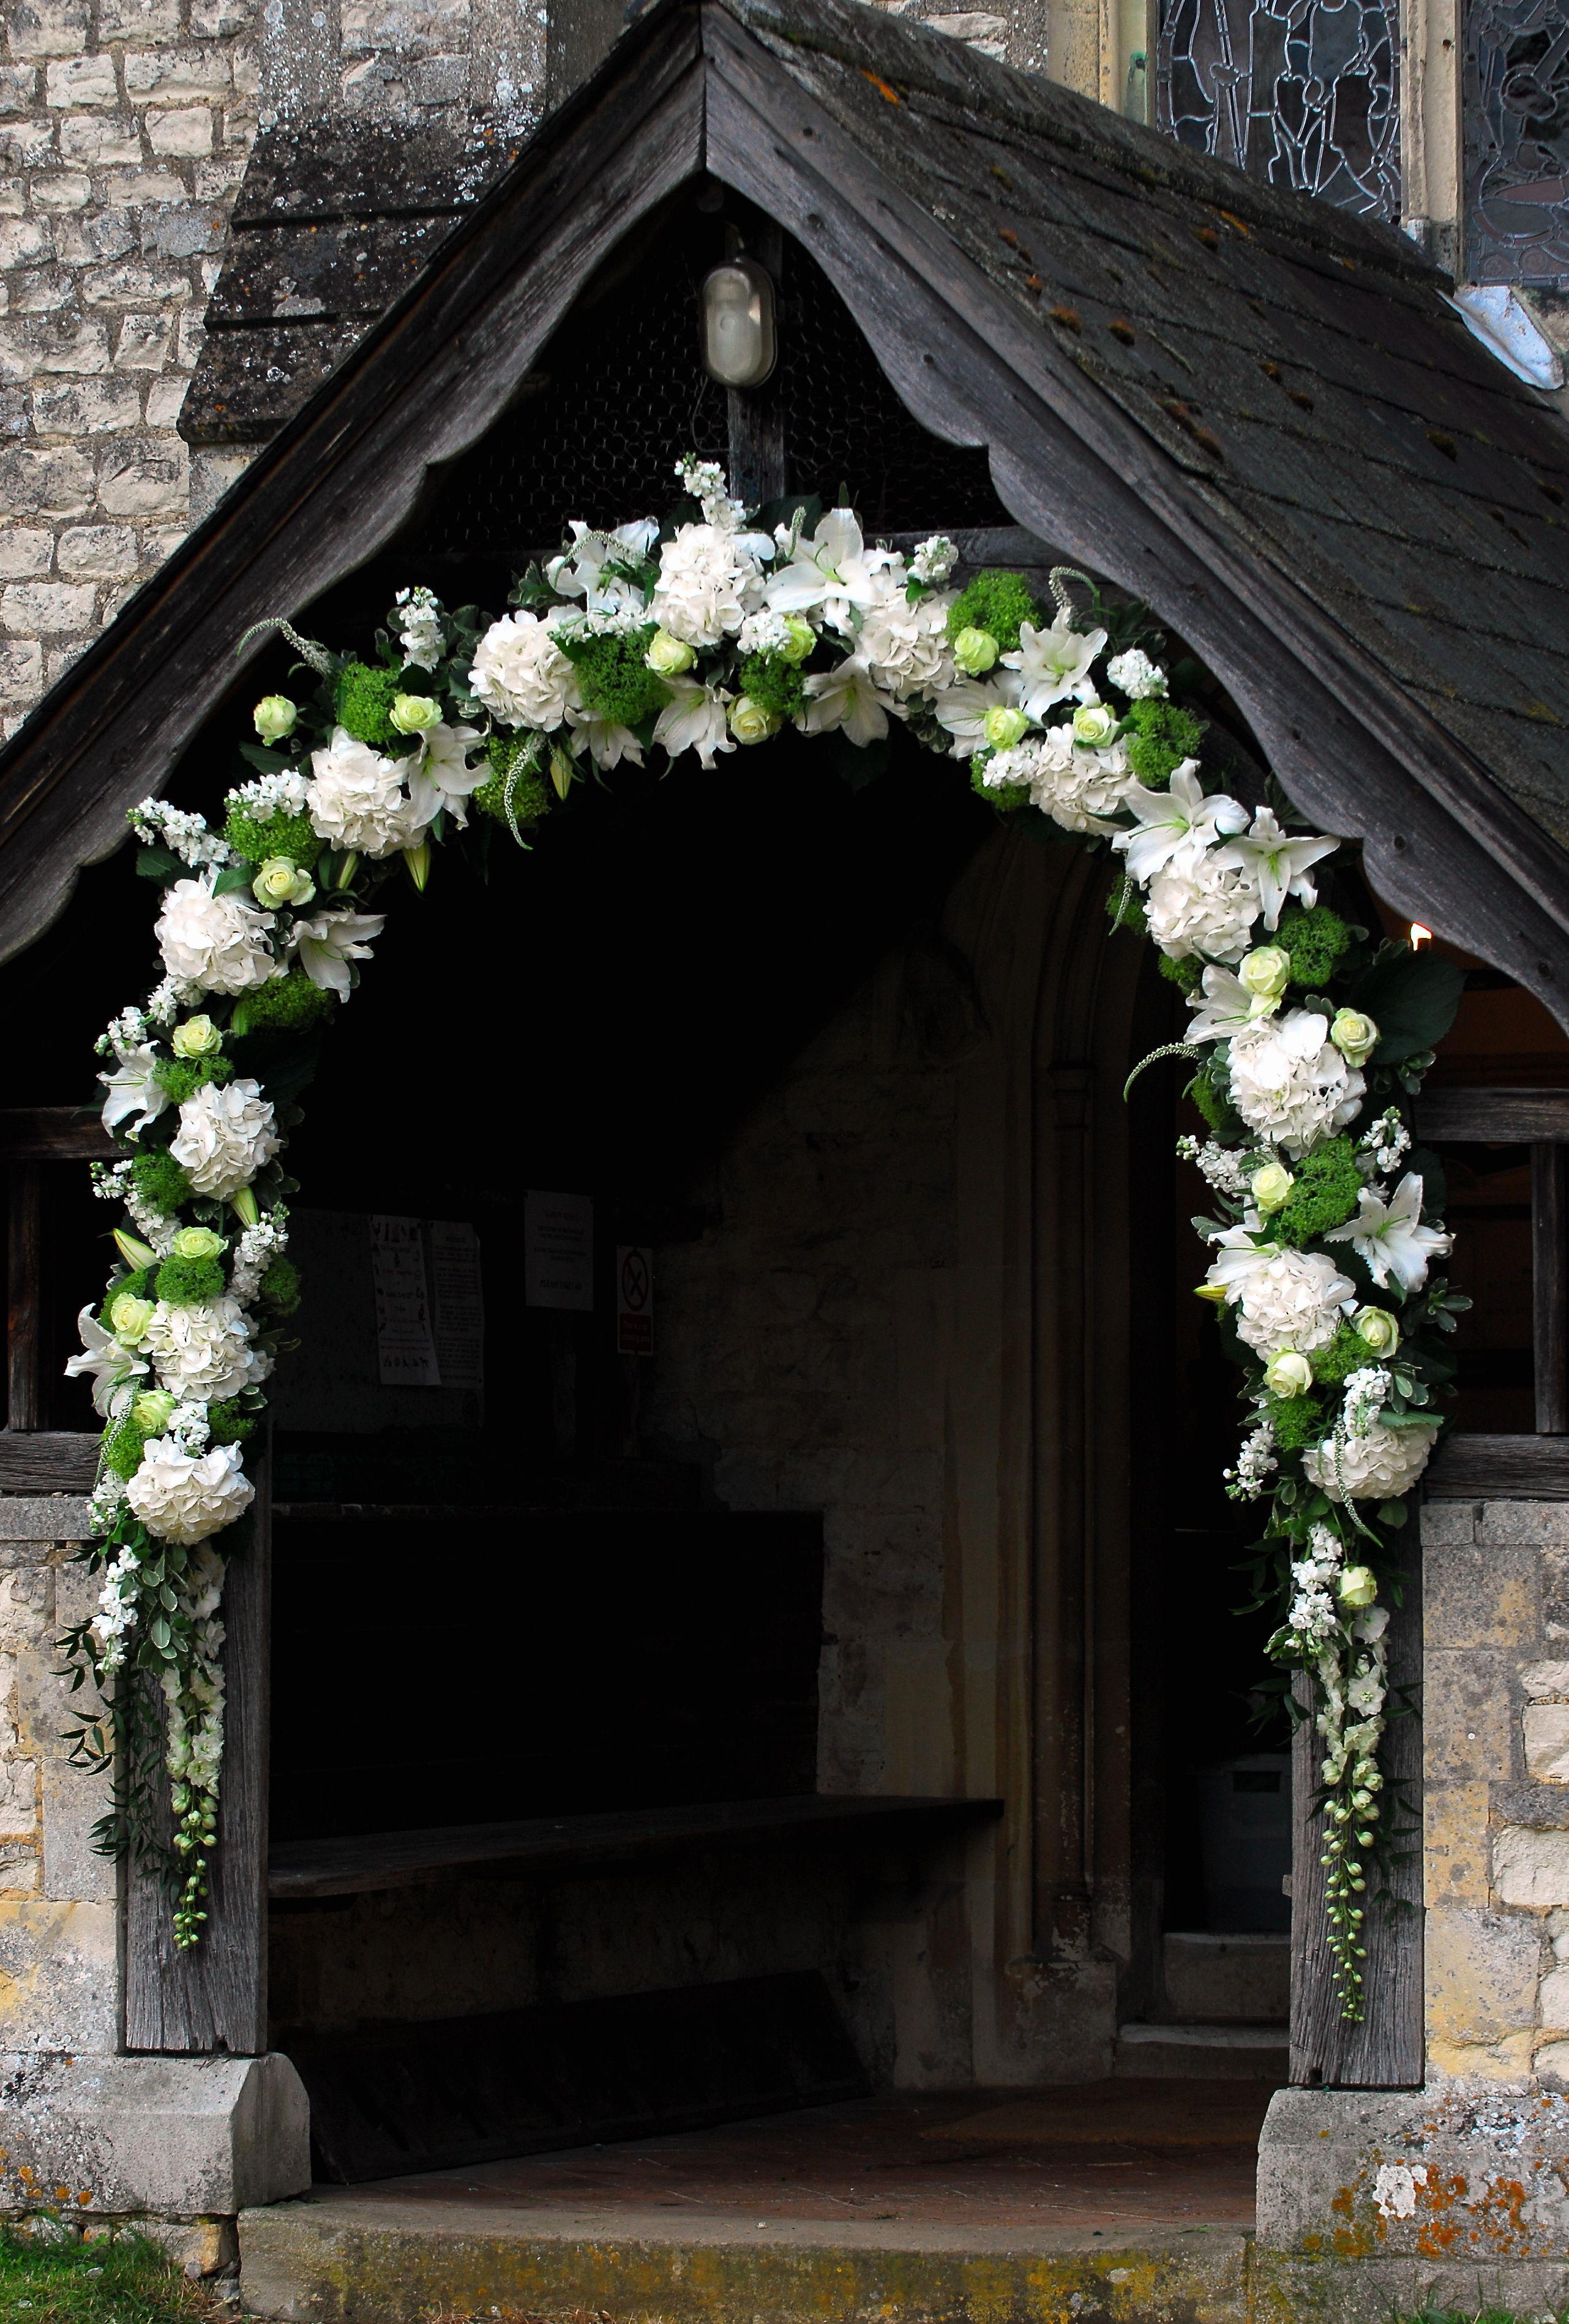 Lovely Arch At A Church Entrance